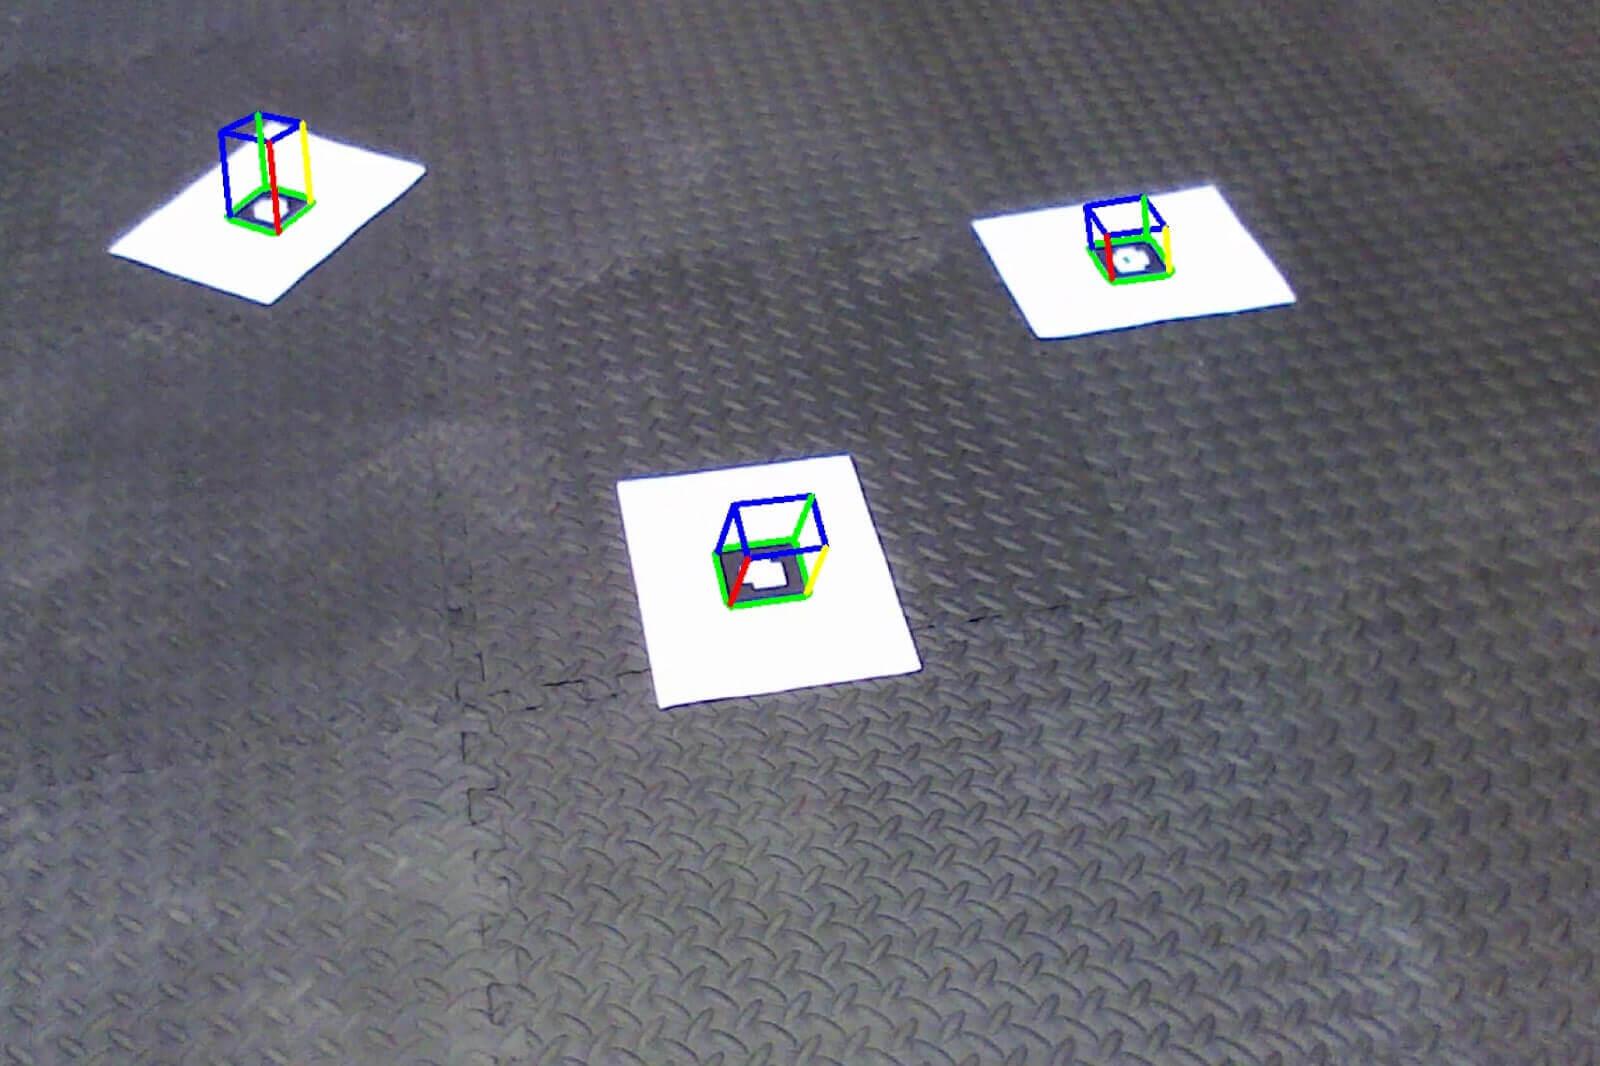 AR Tag Tracking